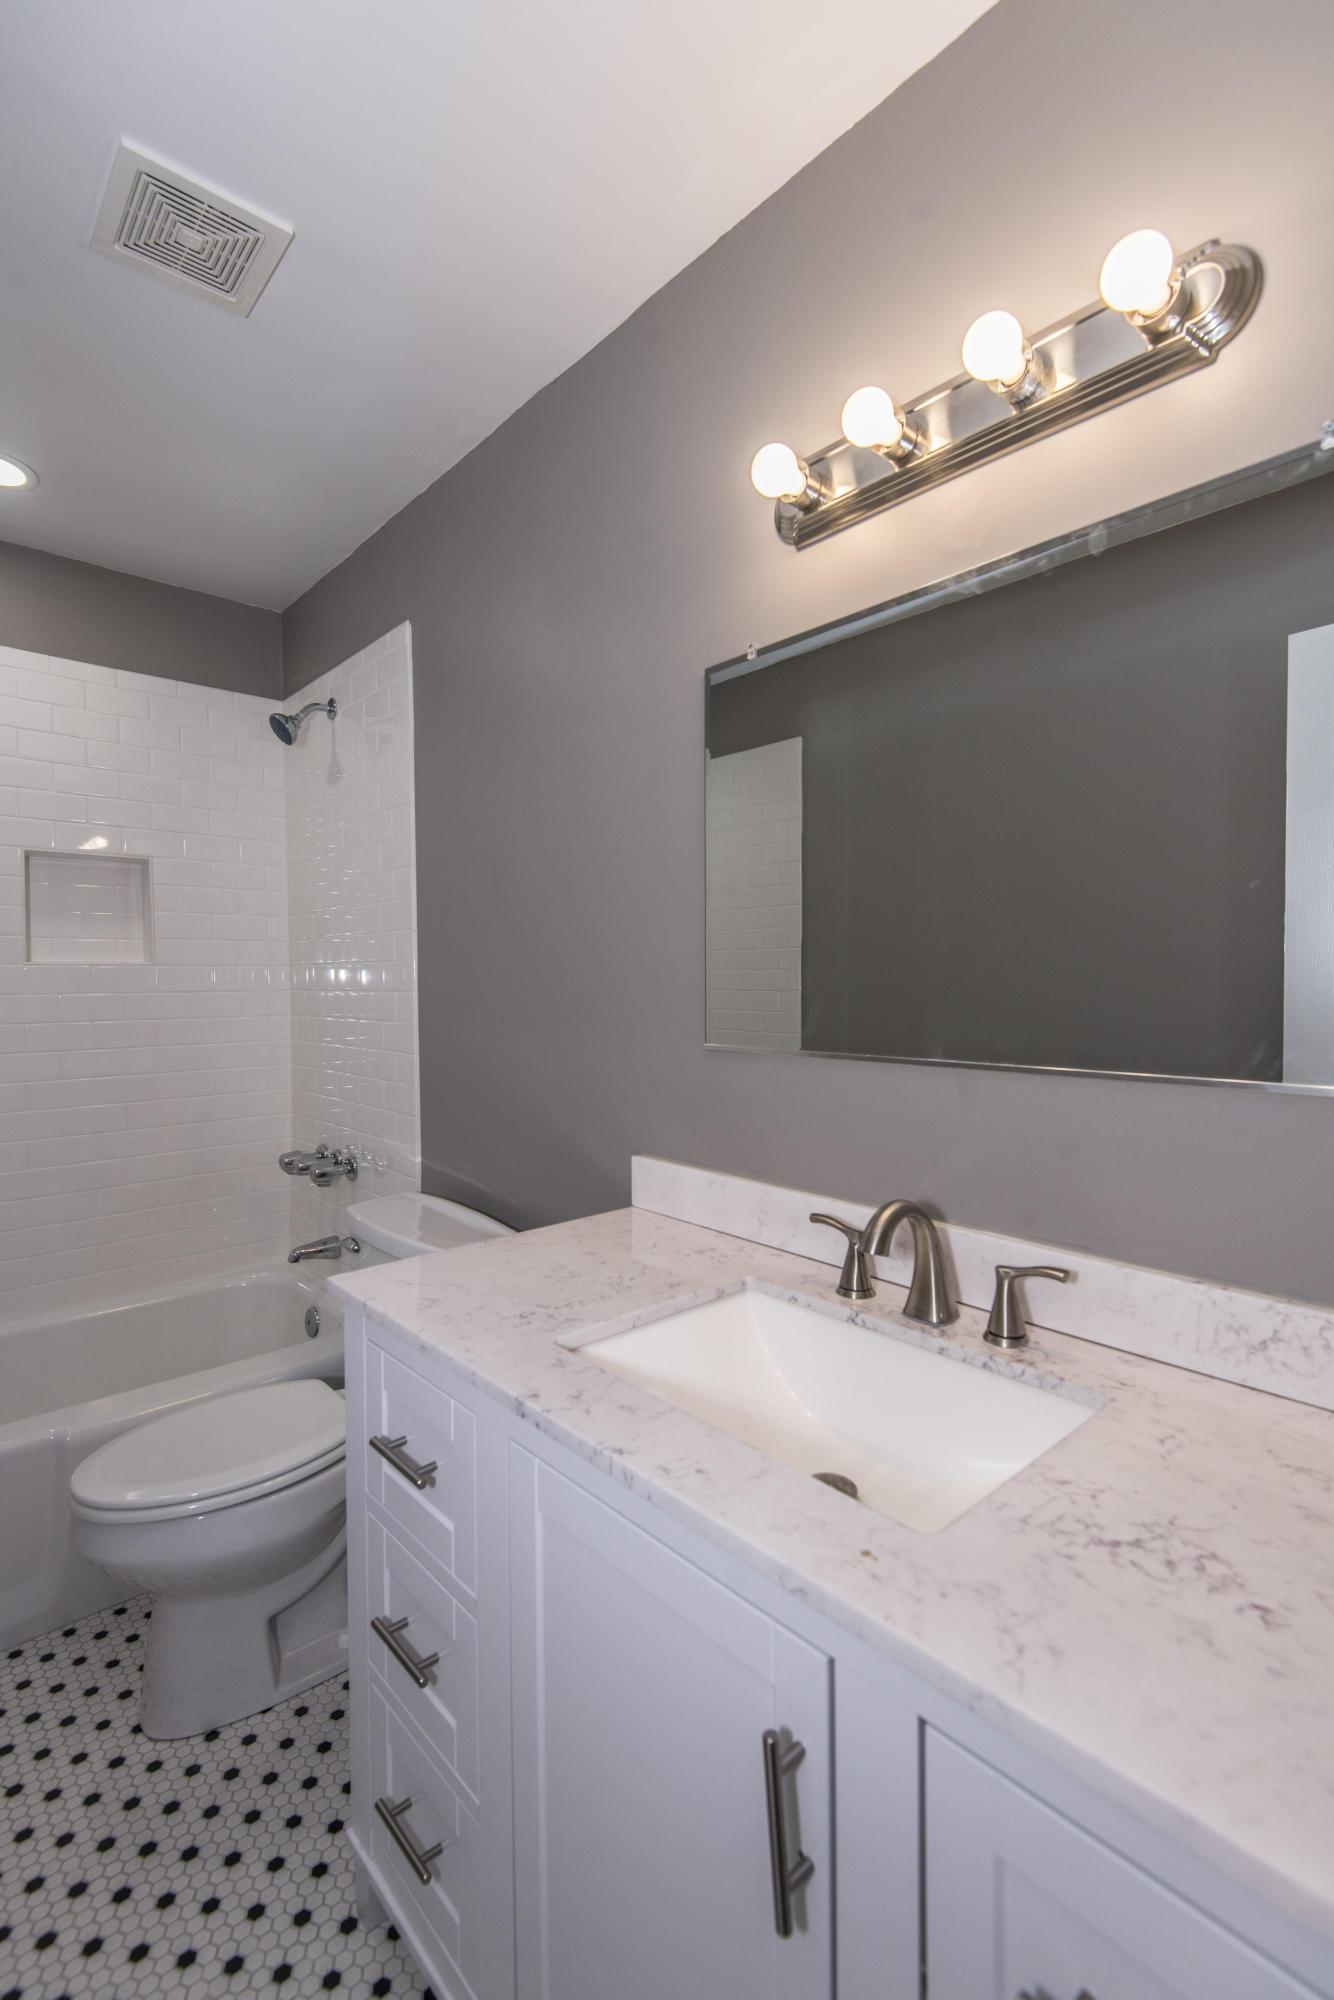 Washington Park Homes For Sale - 1337 5th, Charleston, SC - 12